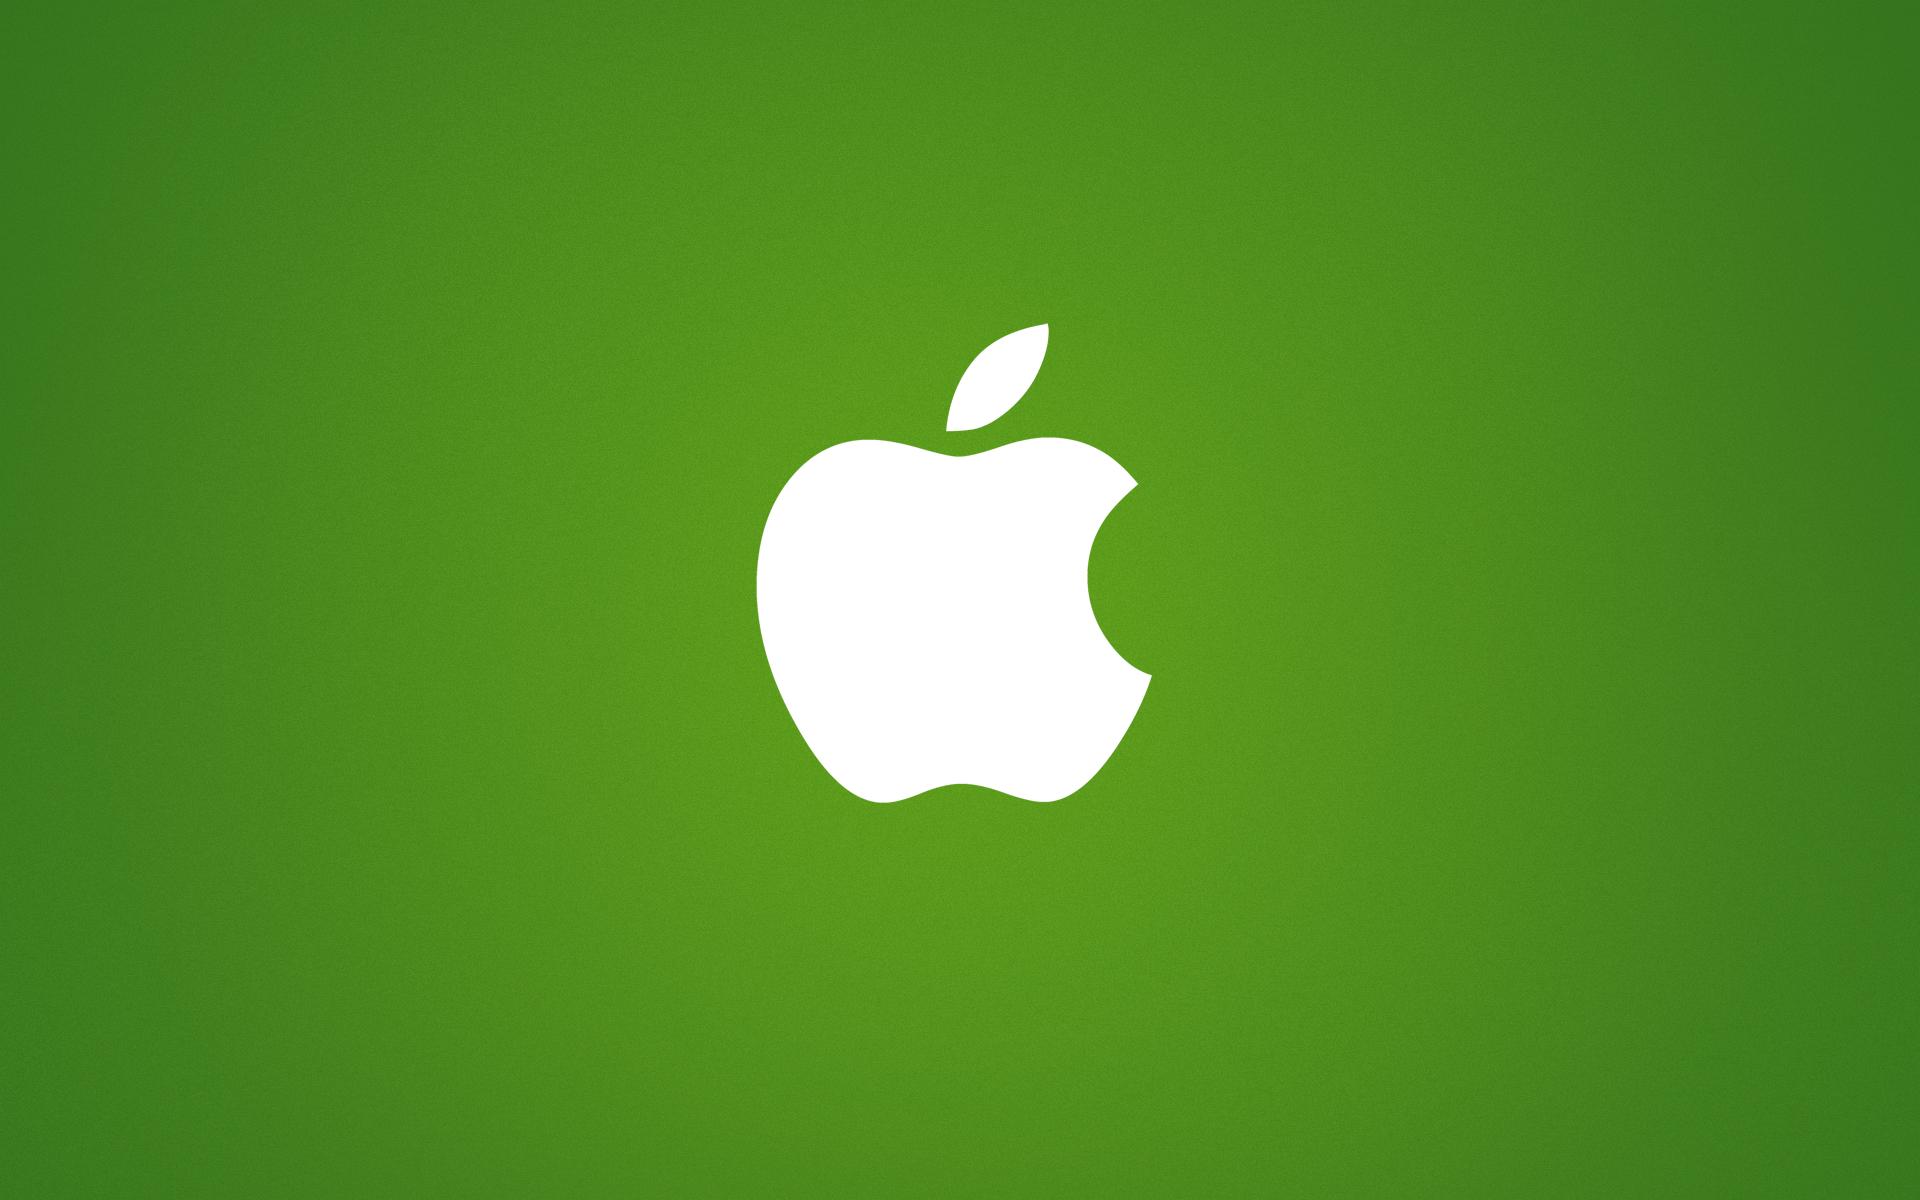 The Brands - Apple